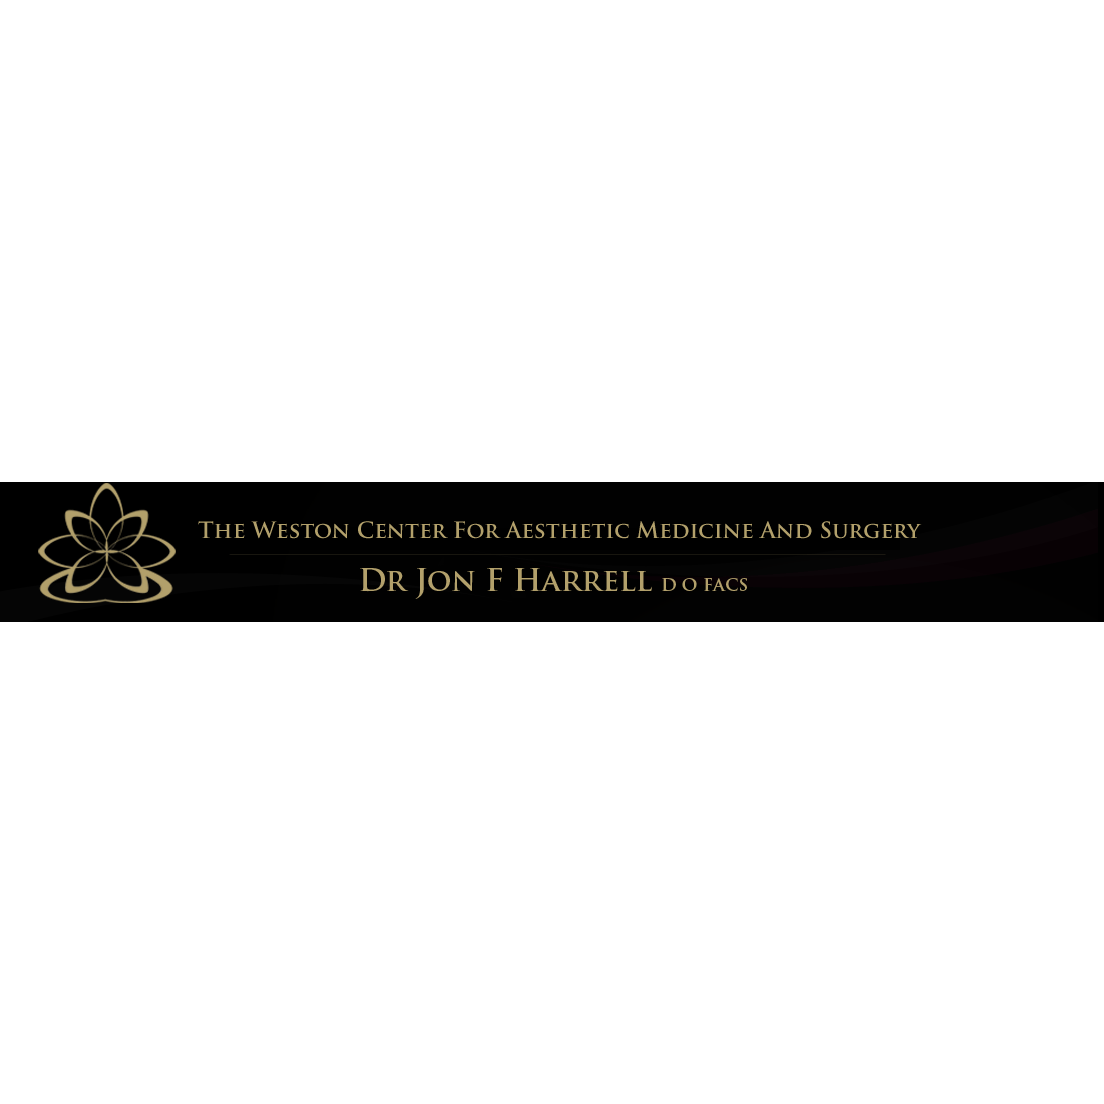 Weston Center for Aesthetic Medicine & Surgery: Dr. Jon Harrell